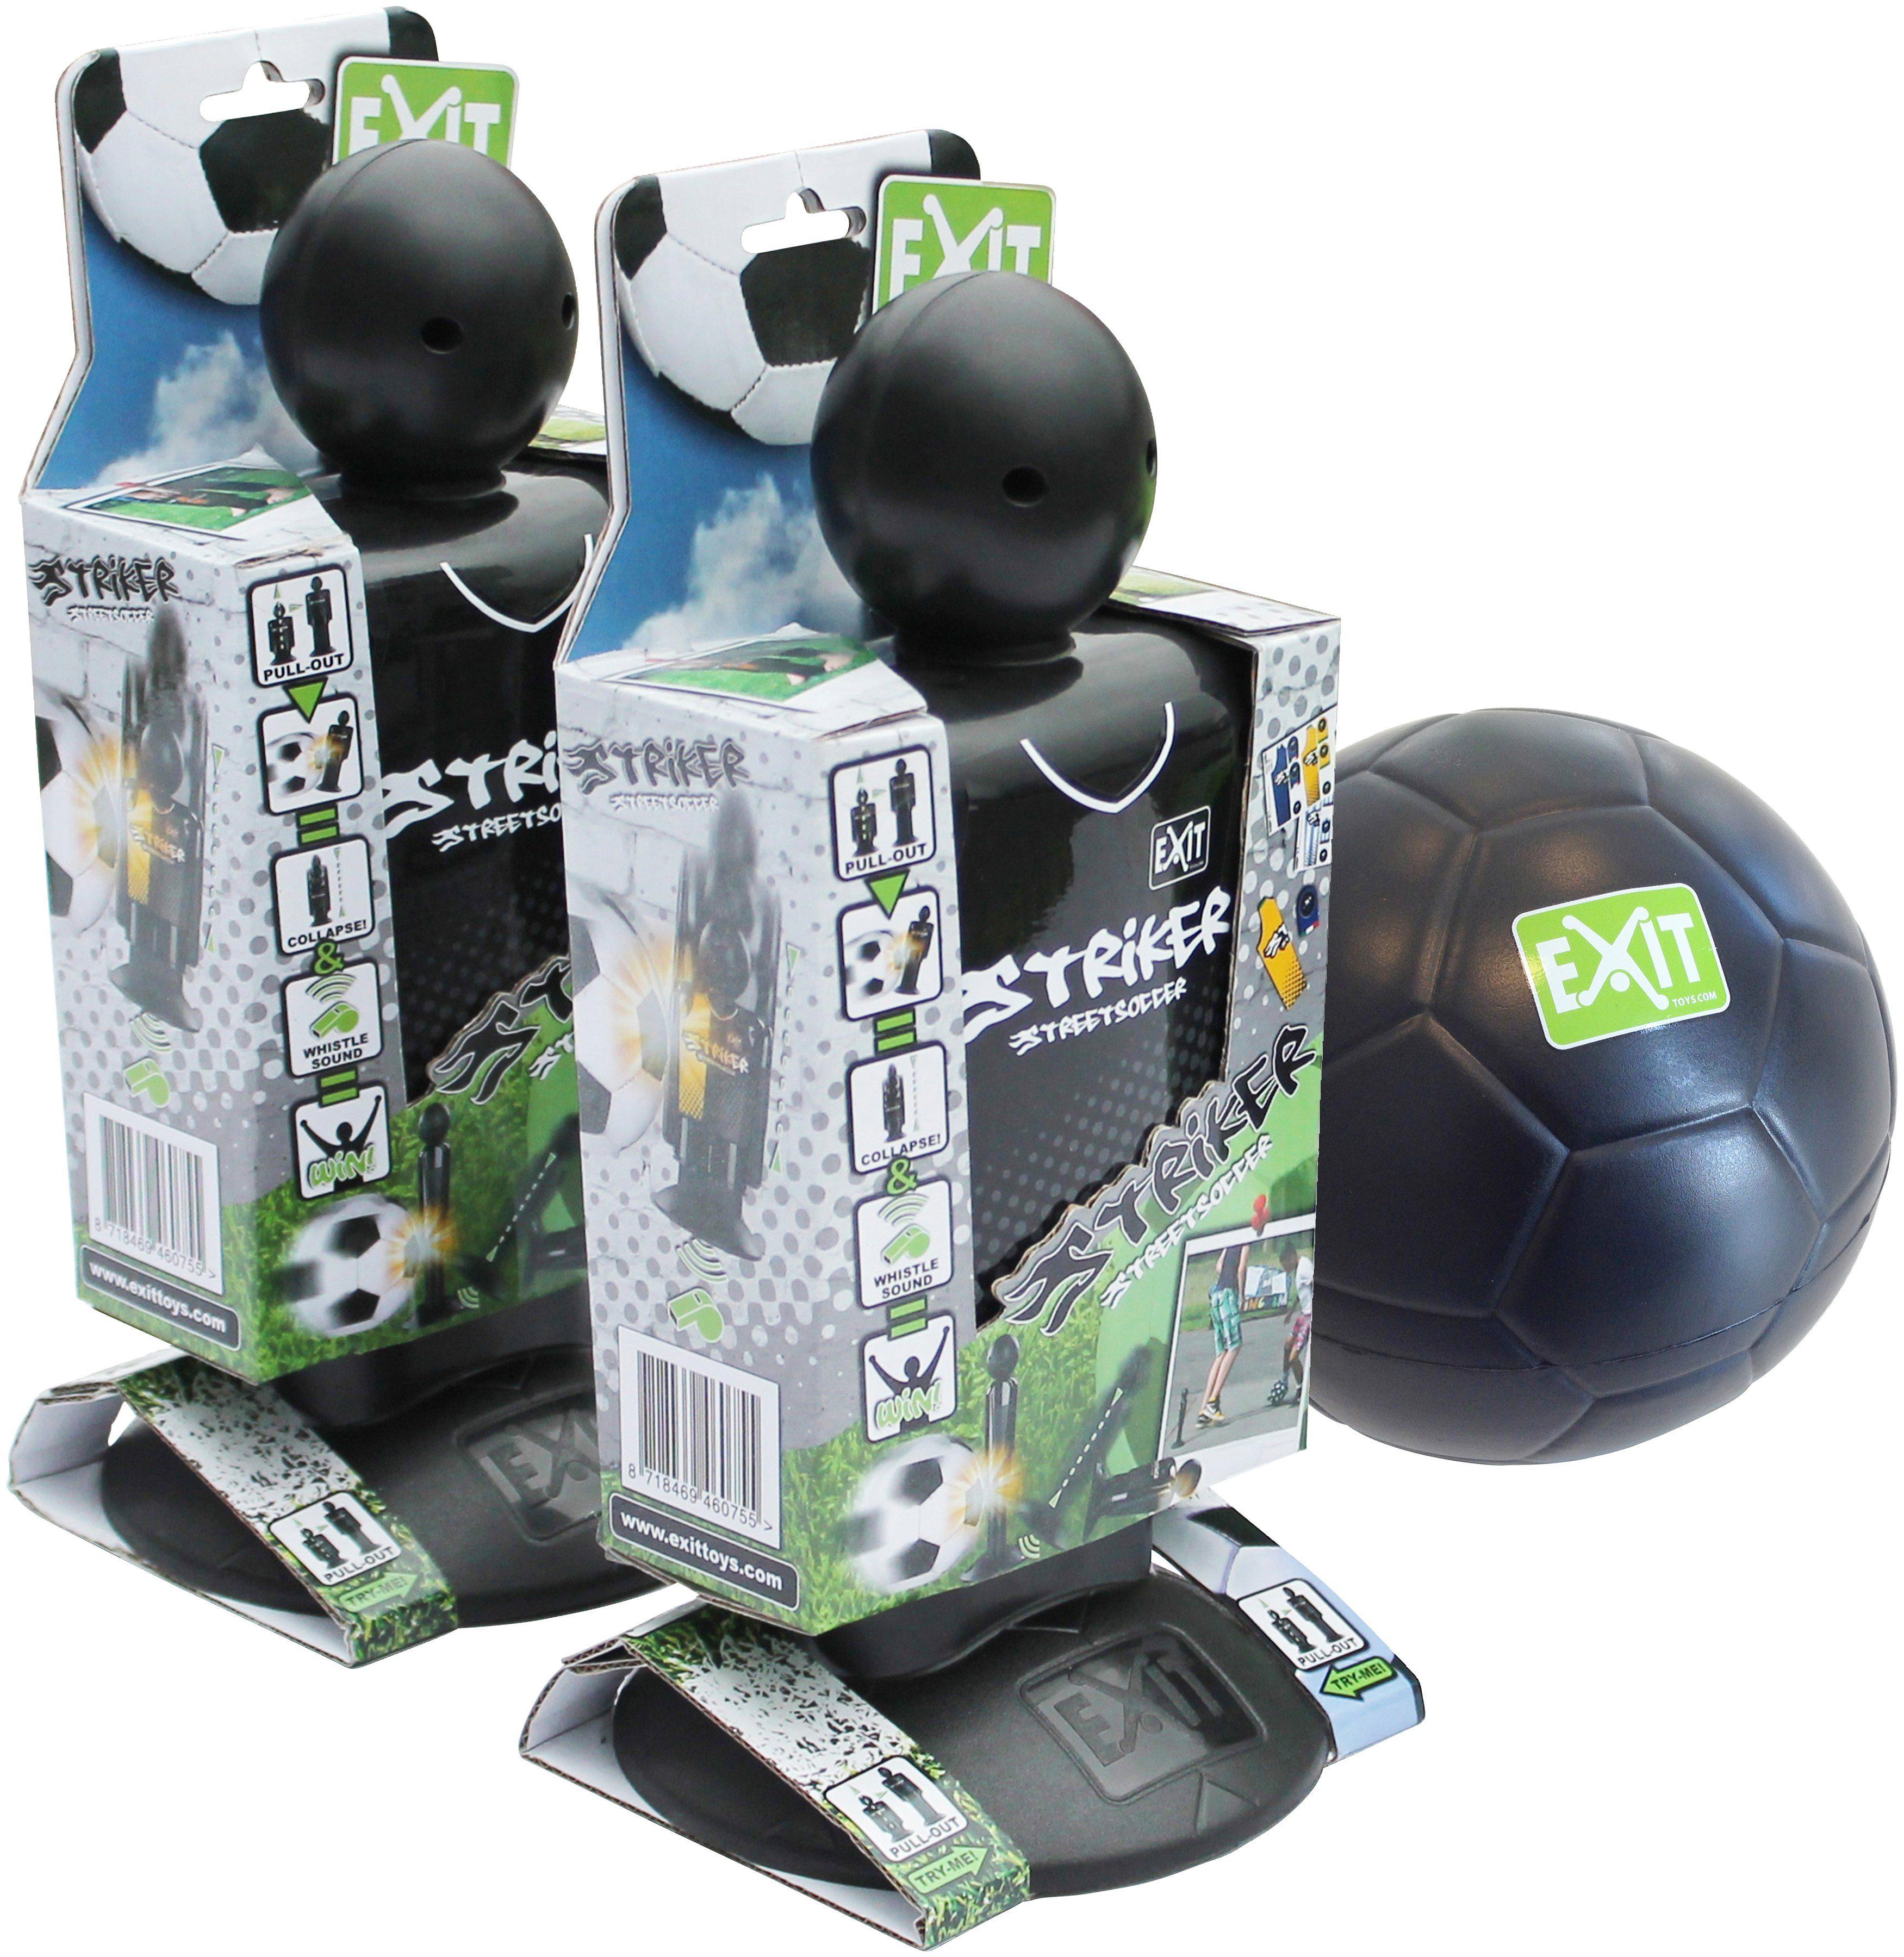 EXIT Streetsoccer »Striker«, 2 Stück mit Mini-Schaumball